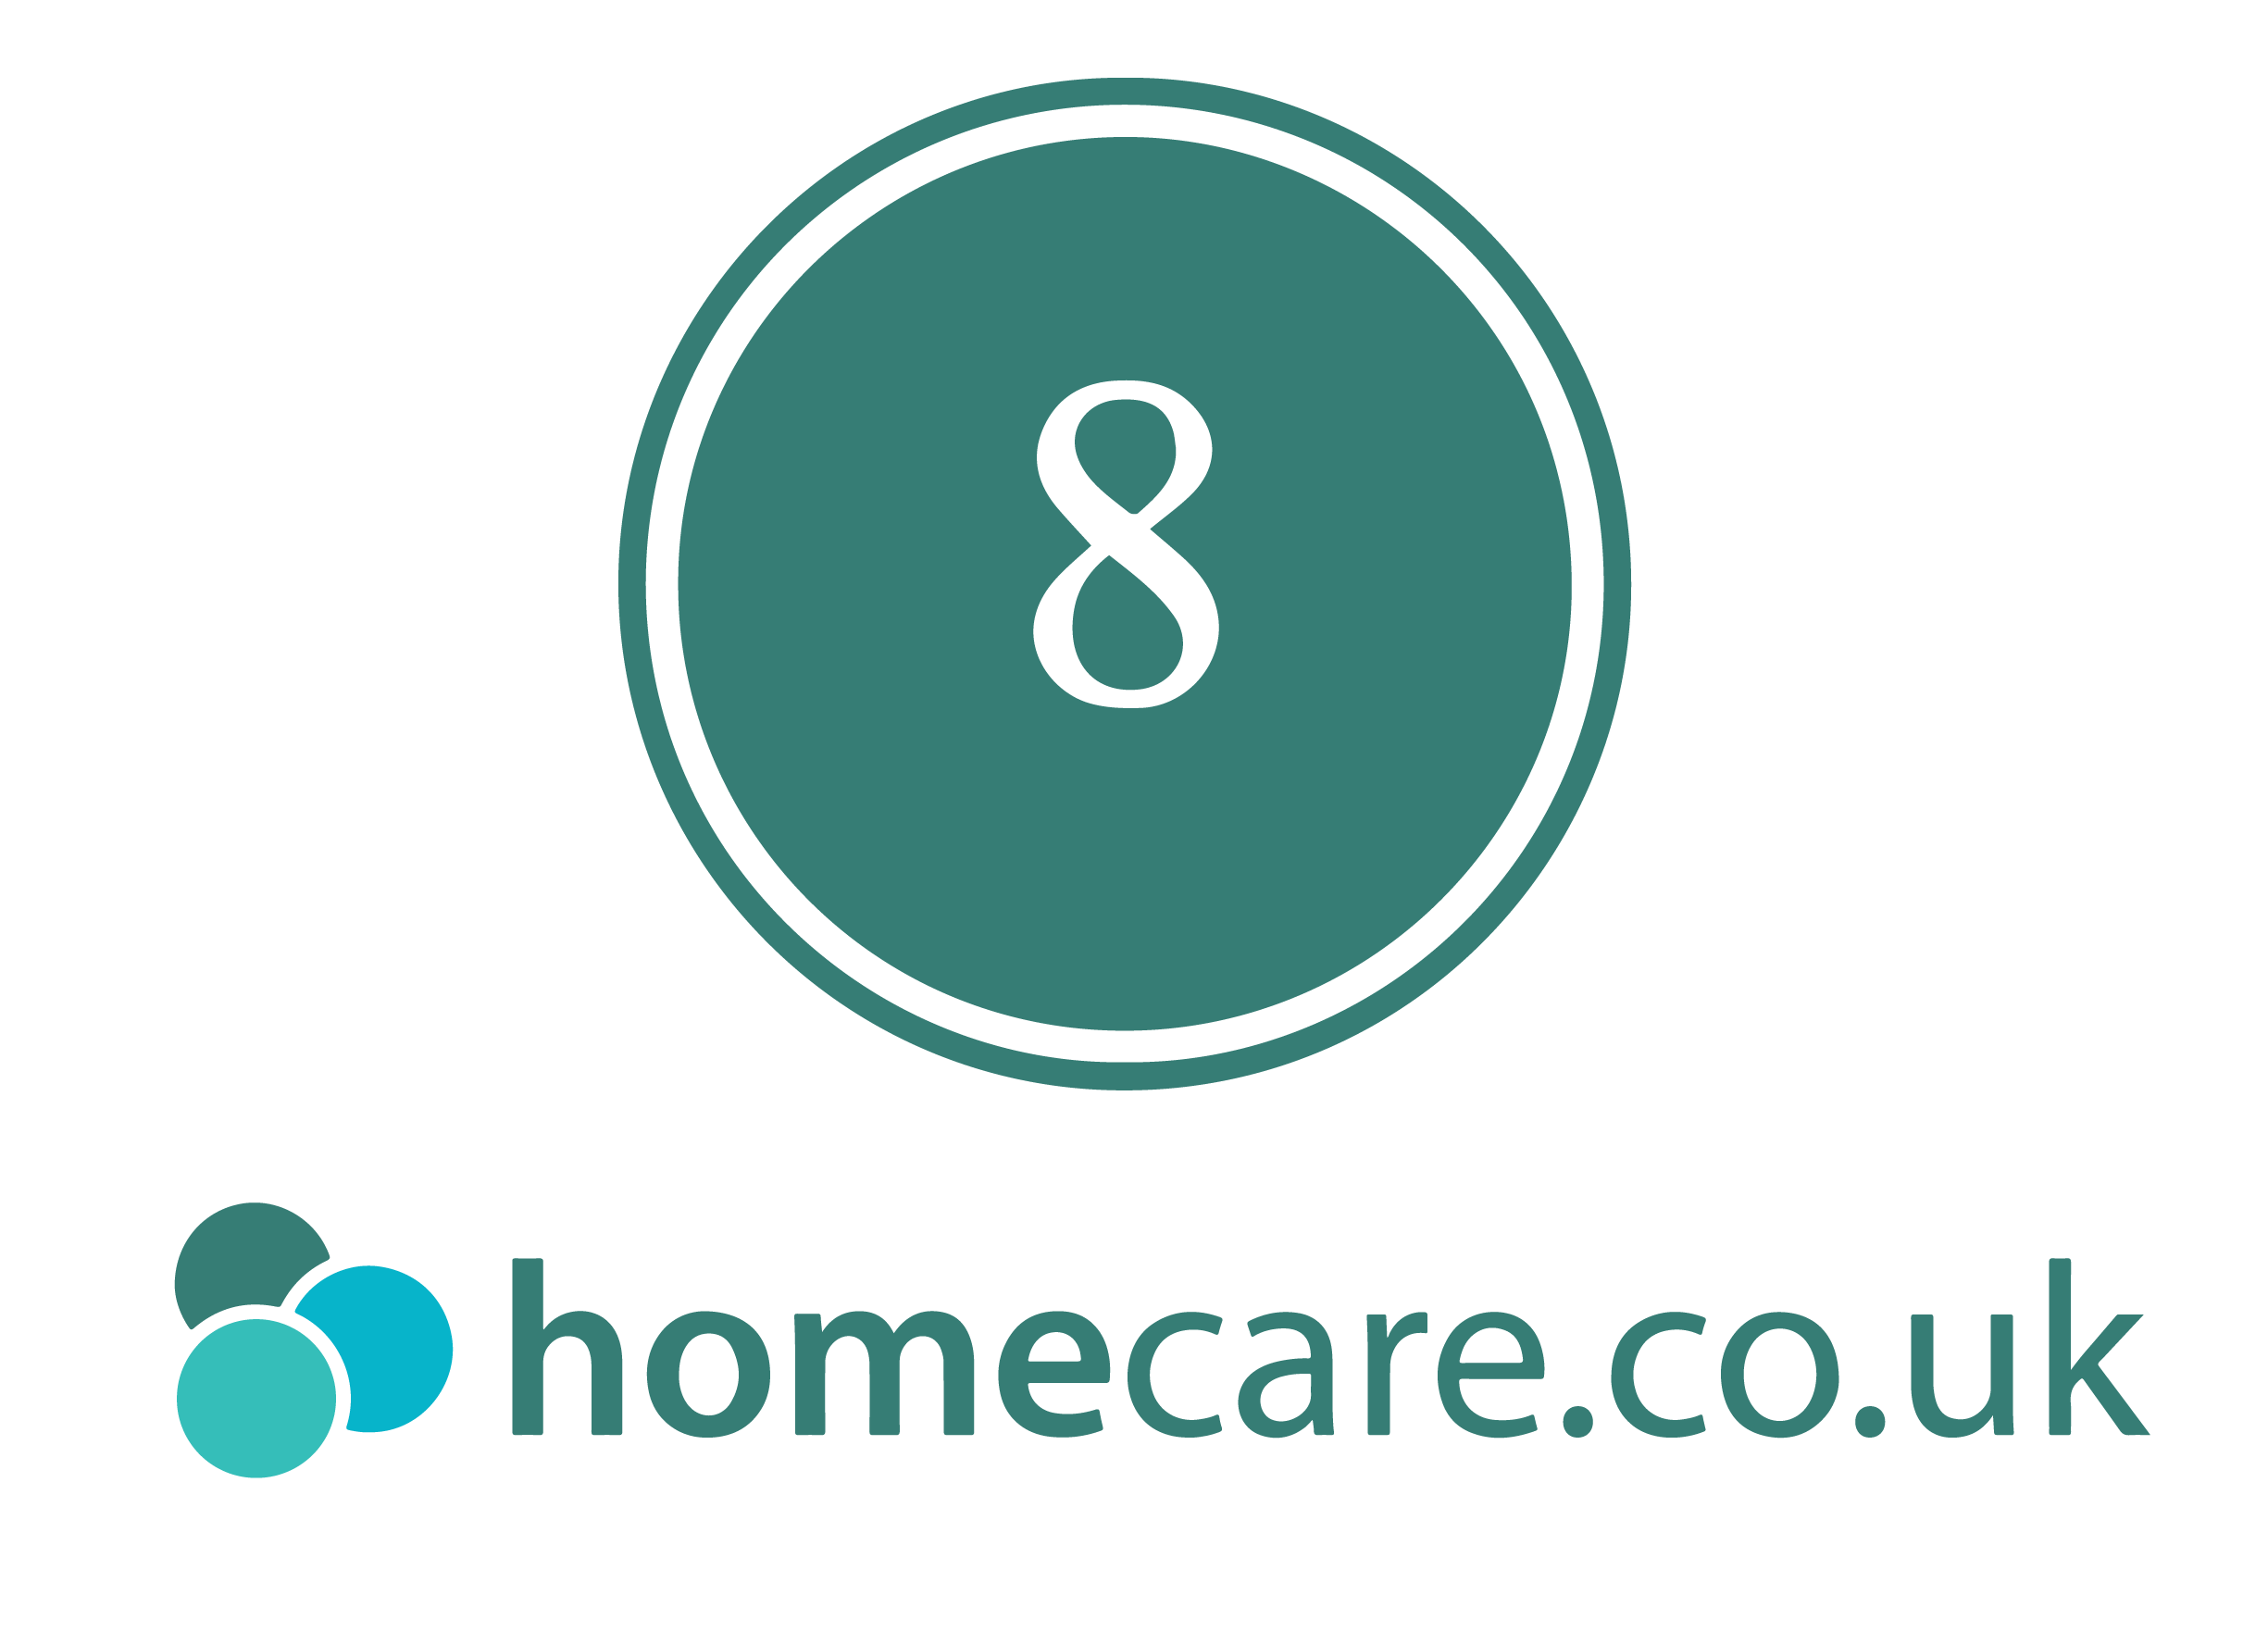 homecare review score 8